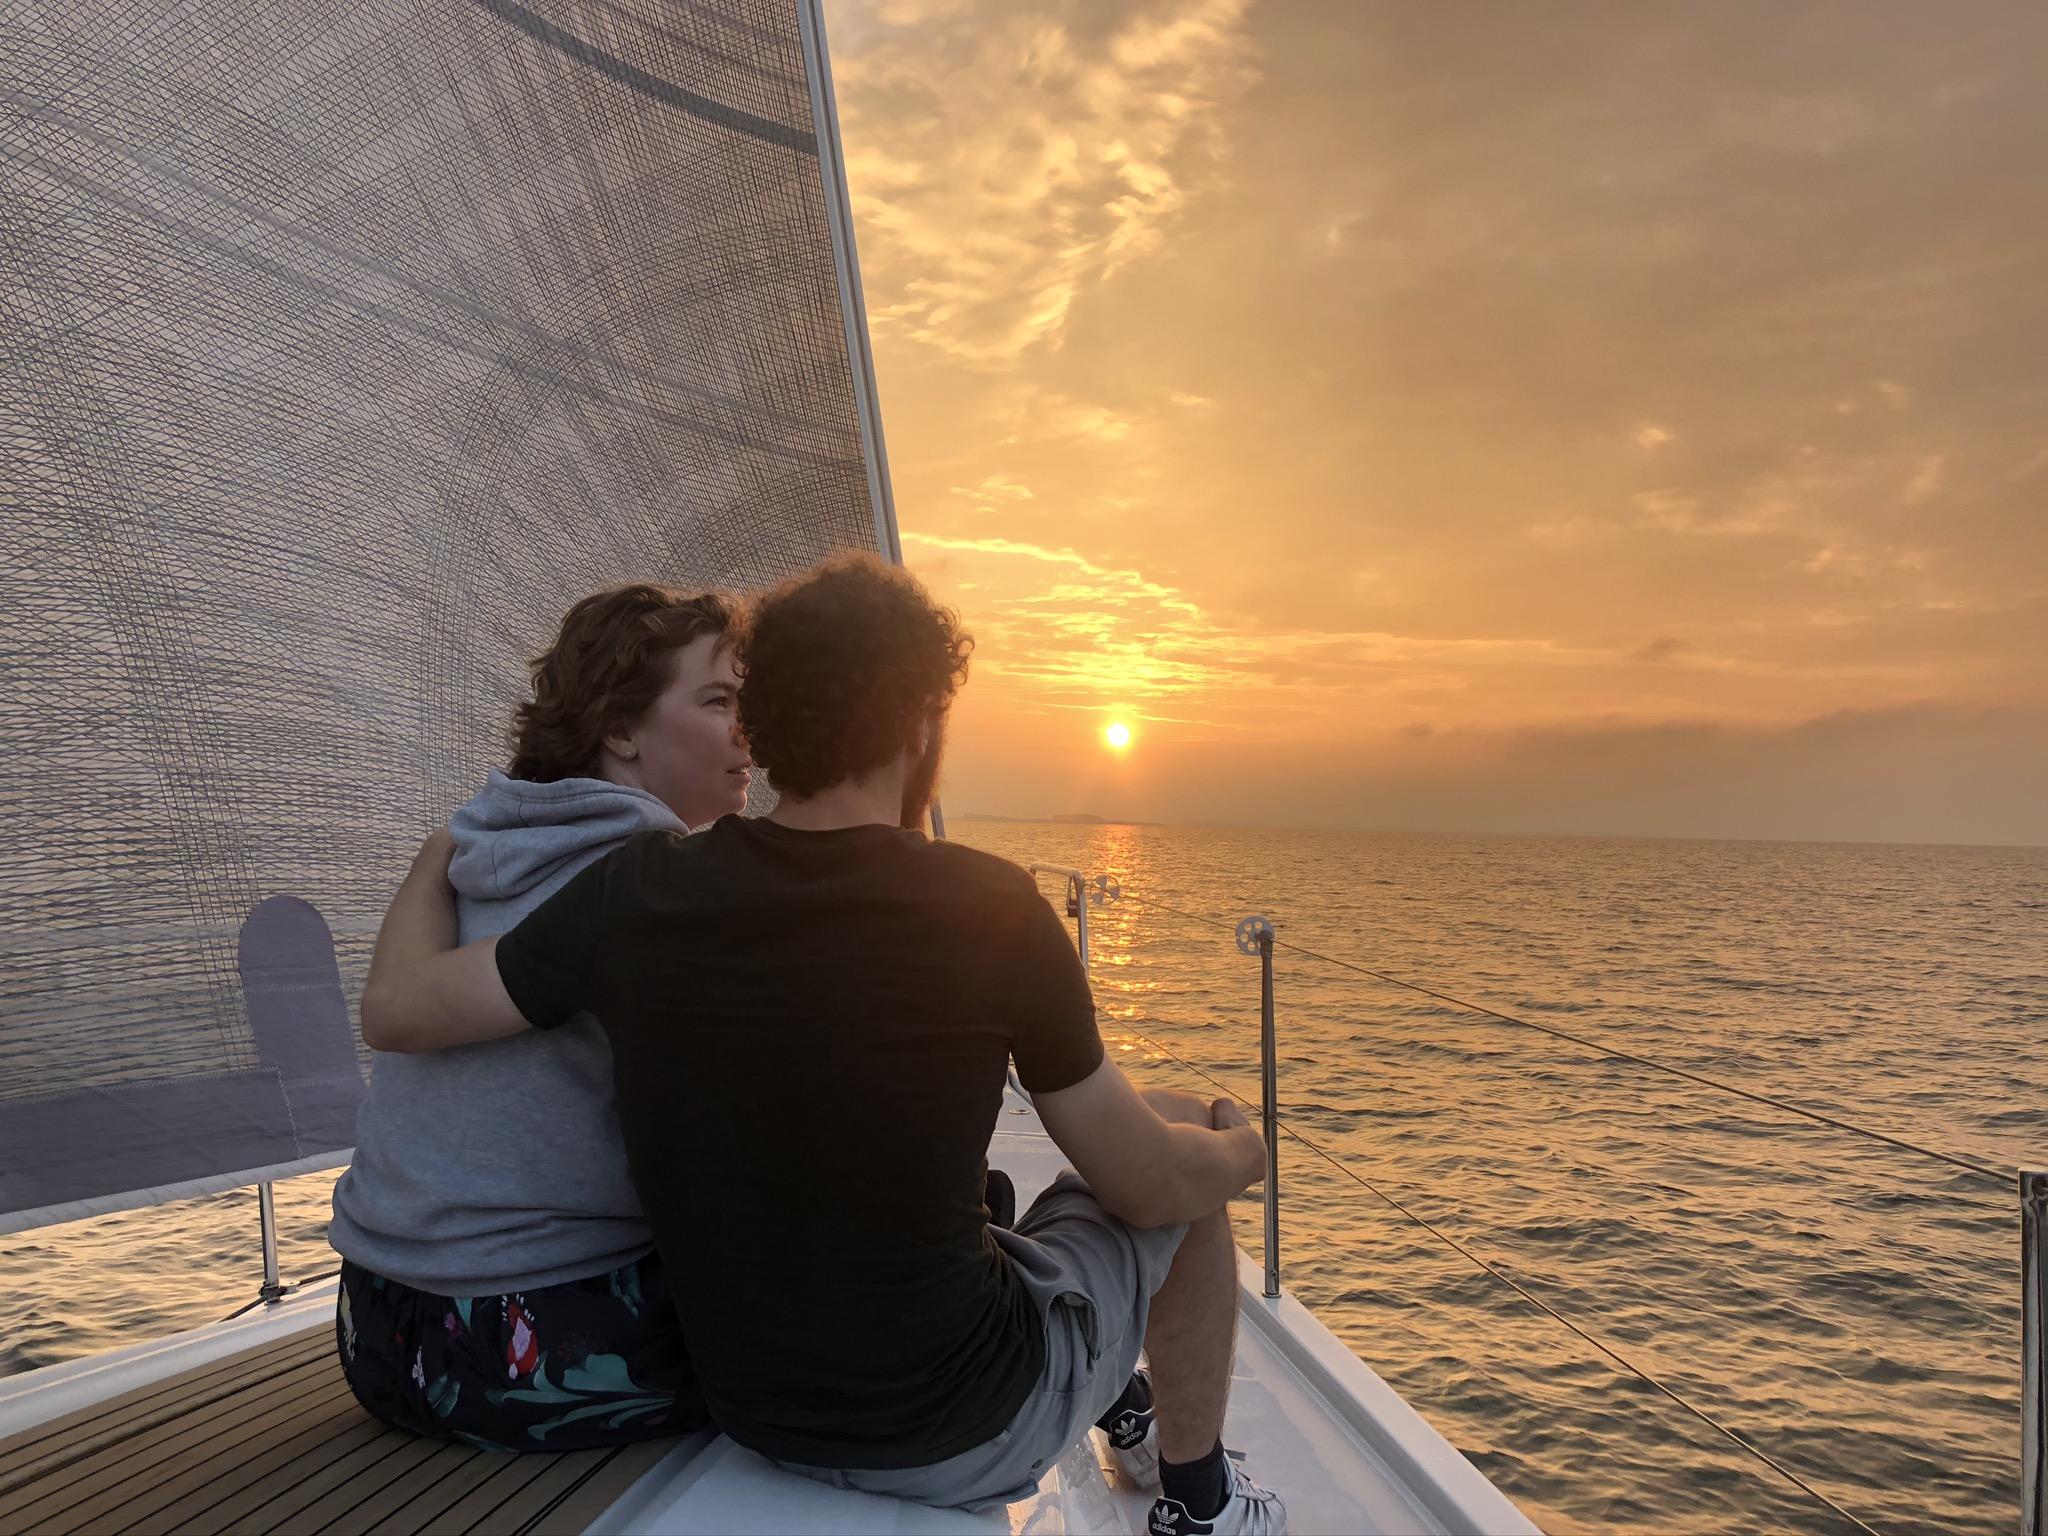 SailForce sunset sailing oosterschelde